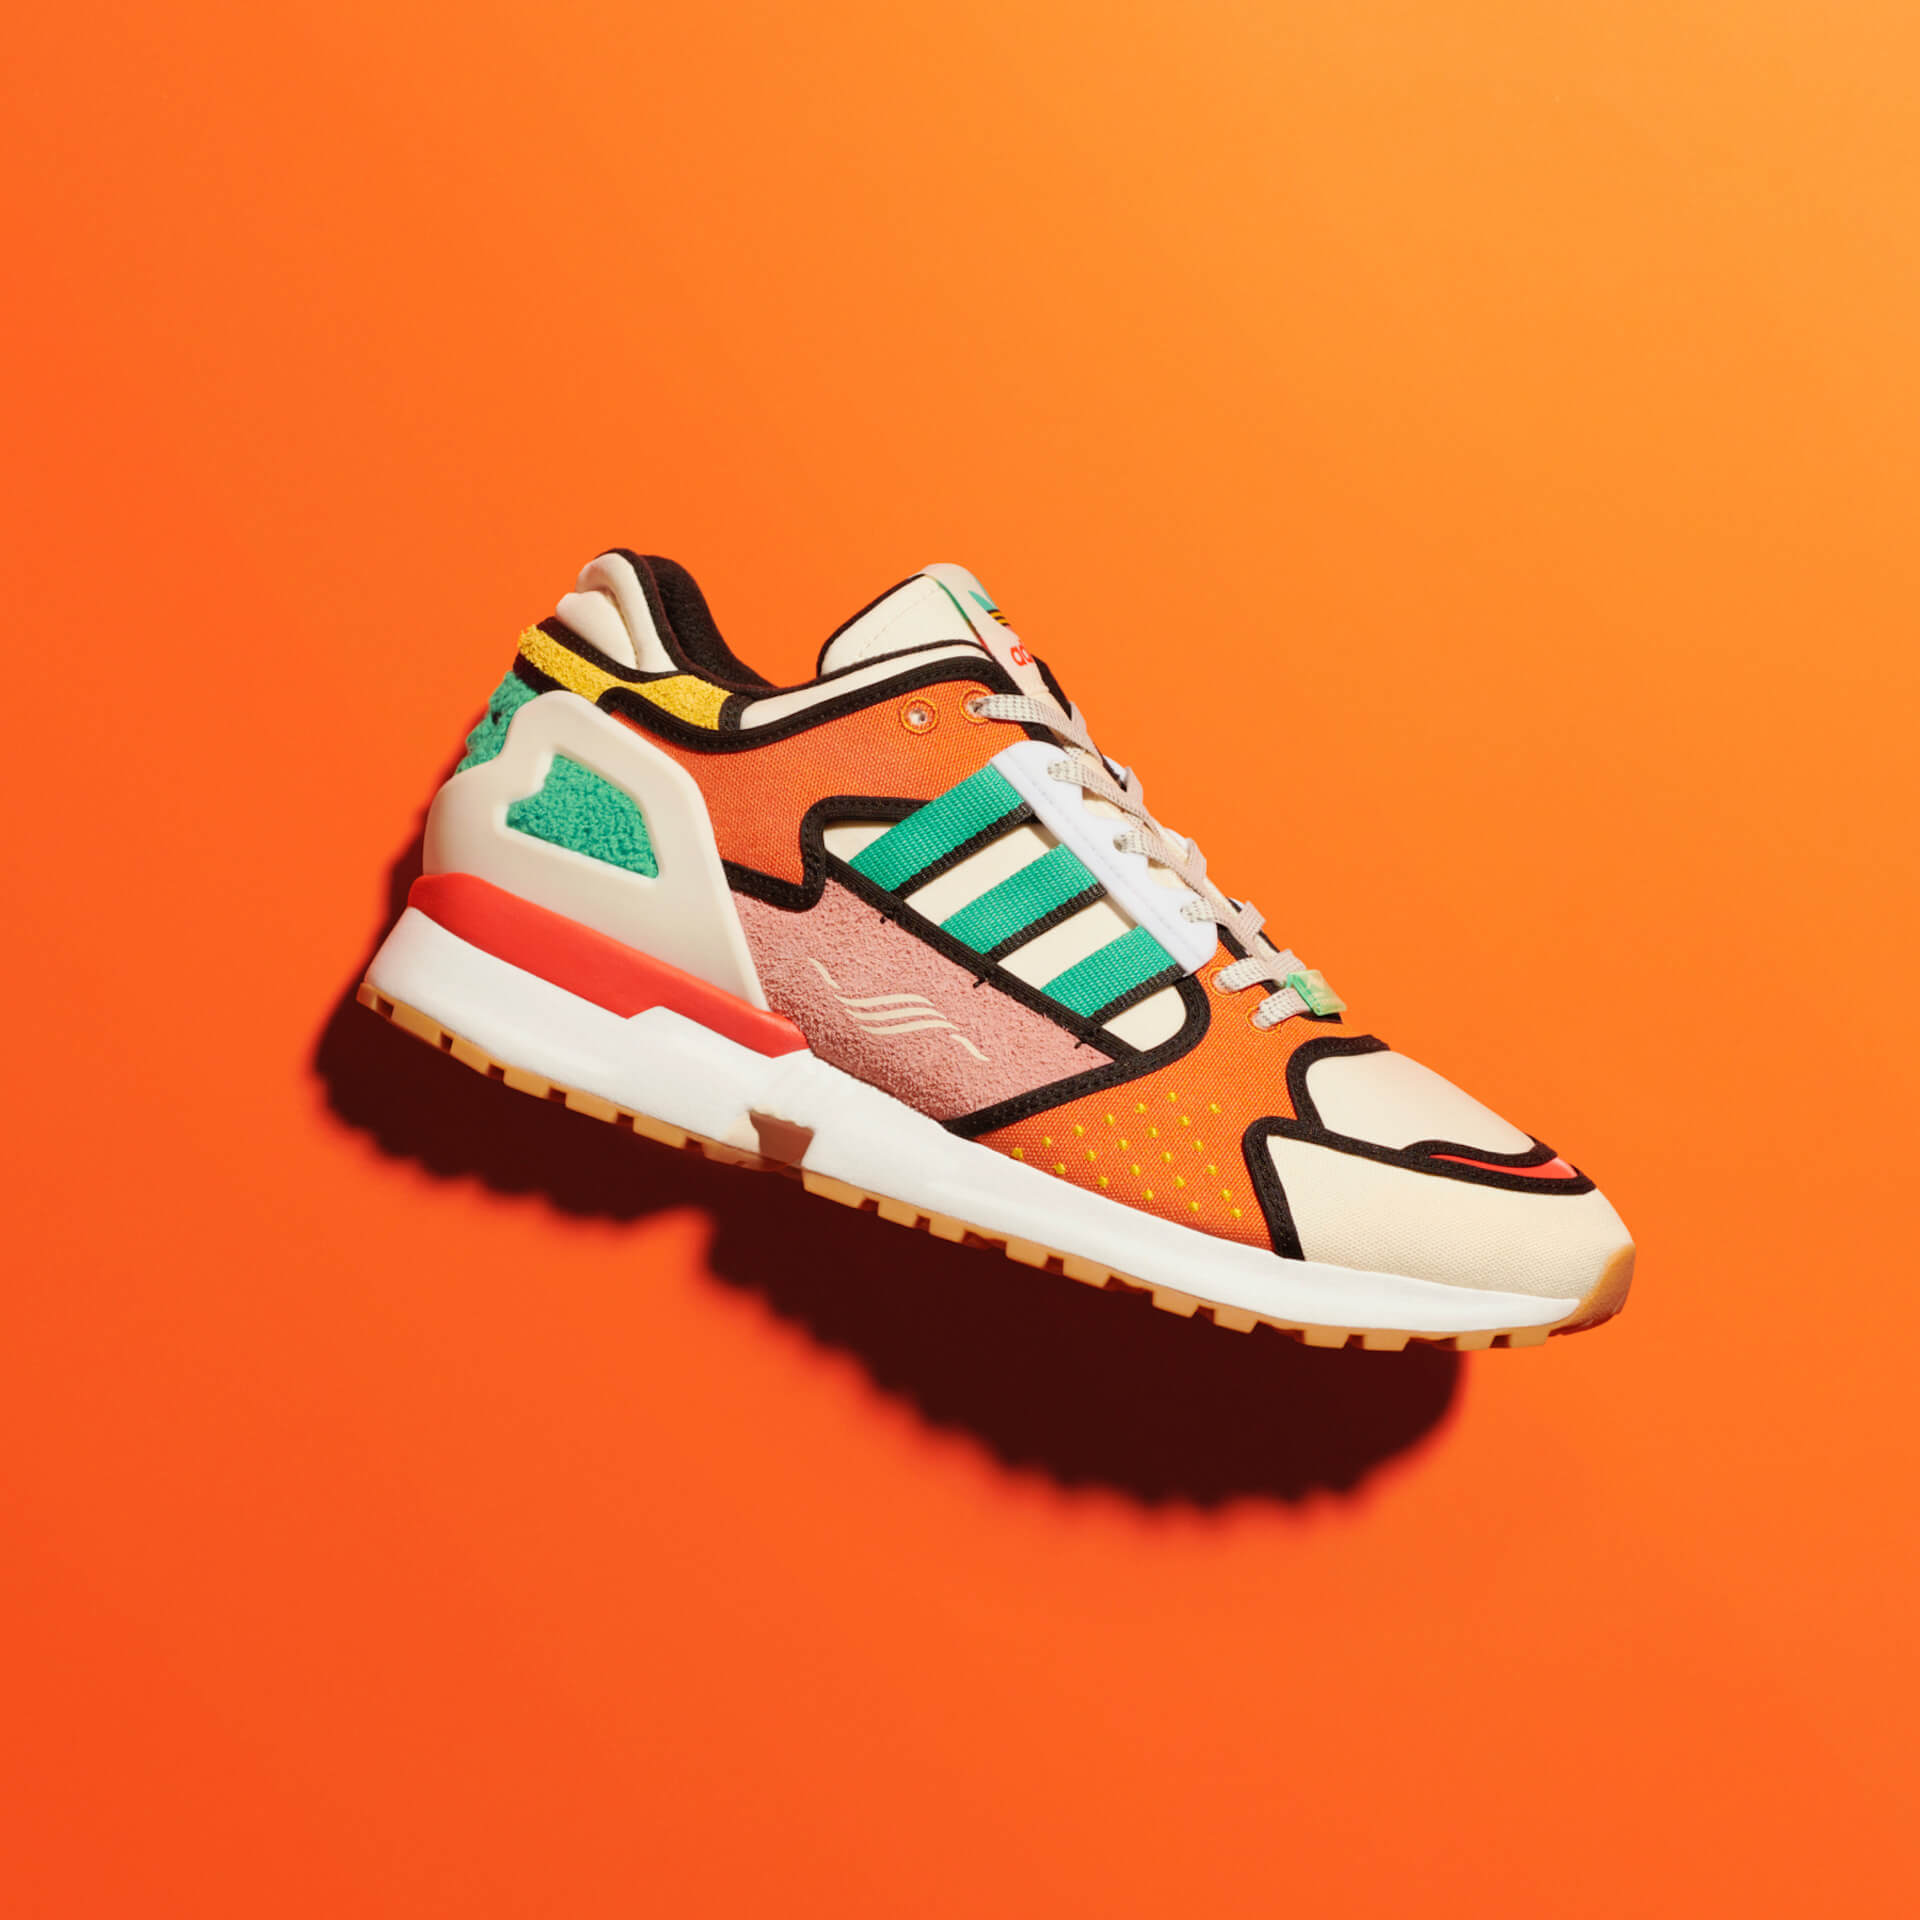 adidas Originals「A-ZX」シリーズにザ・シンプソンズKRUSTY BURGERをモチーフにしたモデルが登場!本日より販売開始 life210212_adidas_thesimpsons_2